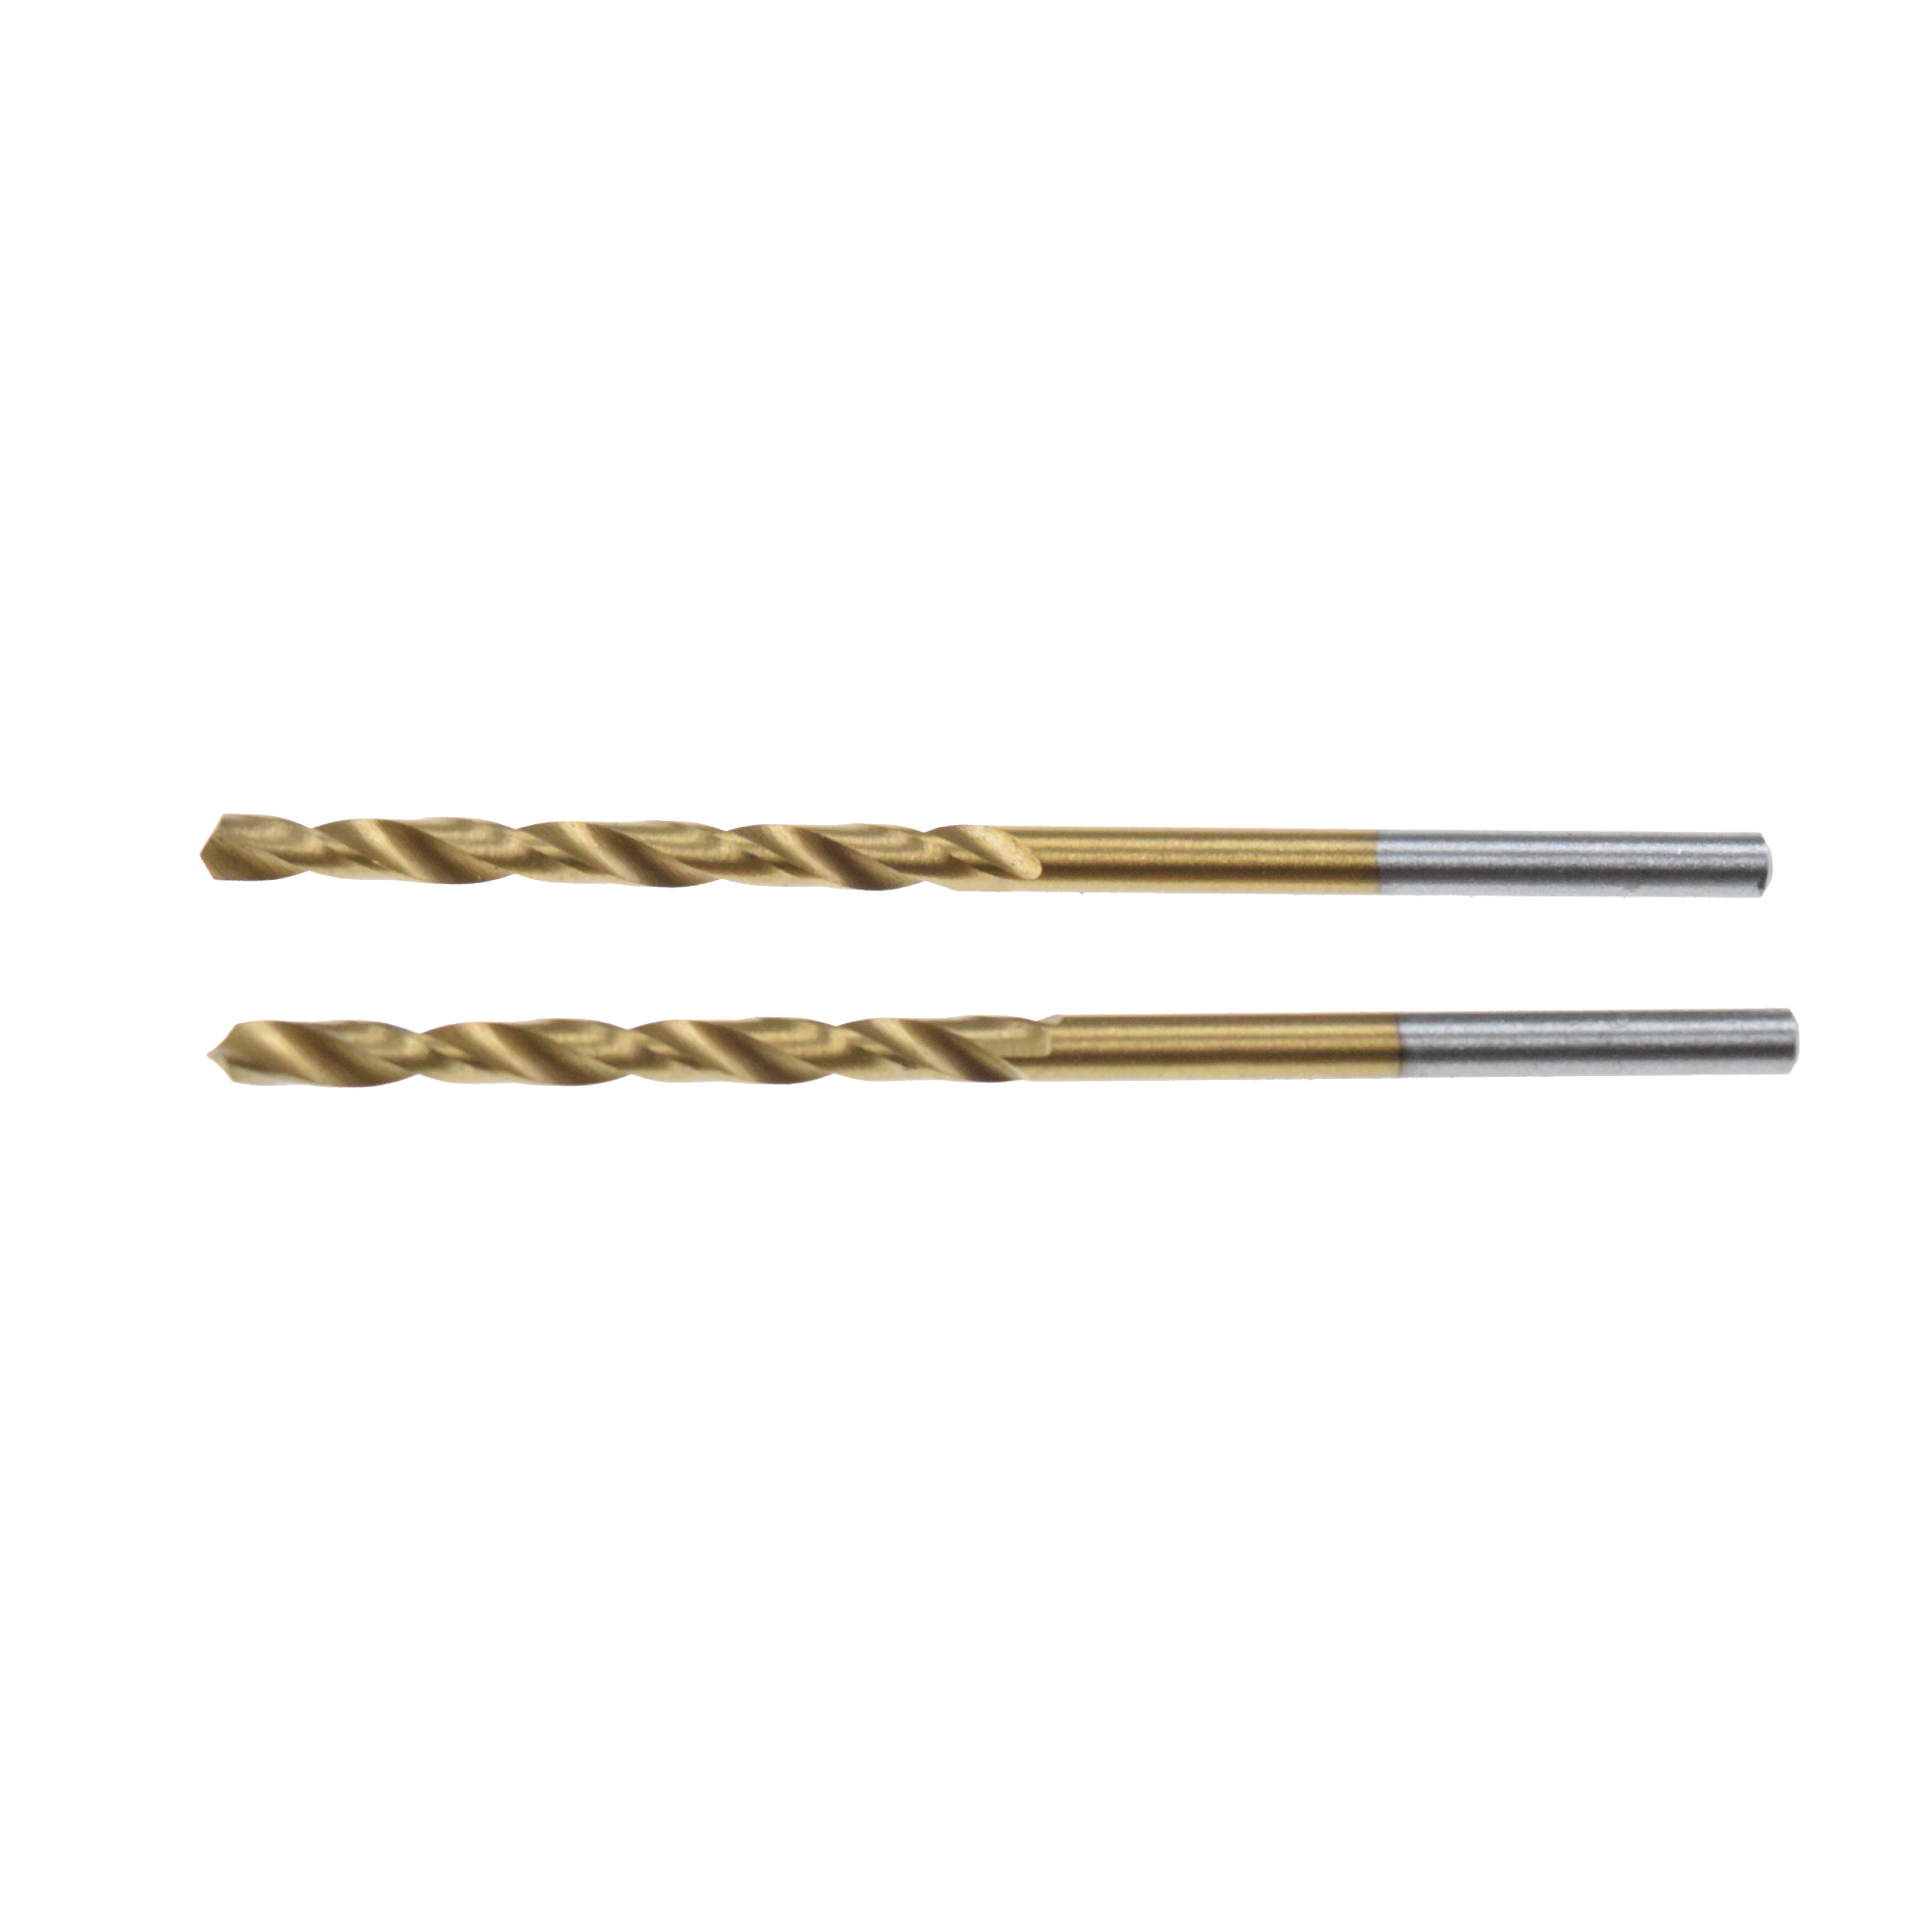 Set 2 bucati burghie pentru metal HSS Titan marca Irwin de 2.5 x 30 x 57 mm